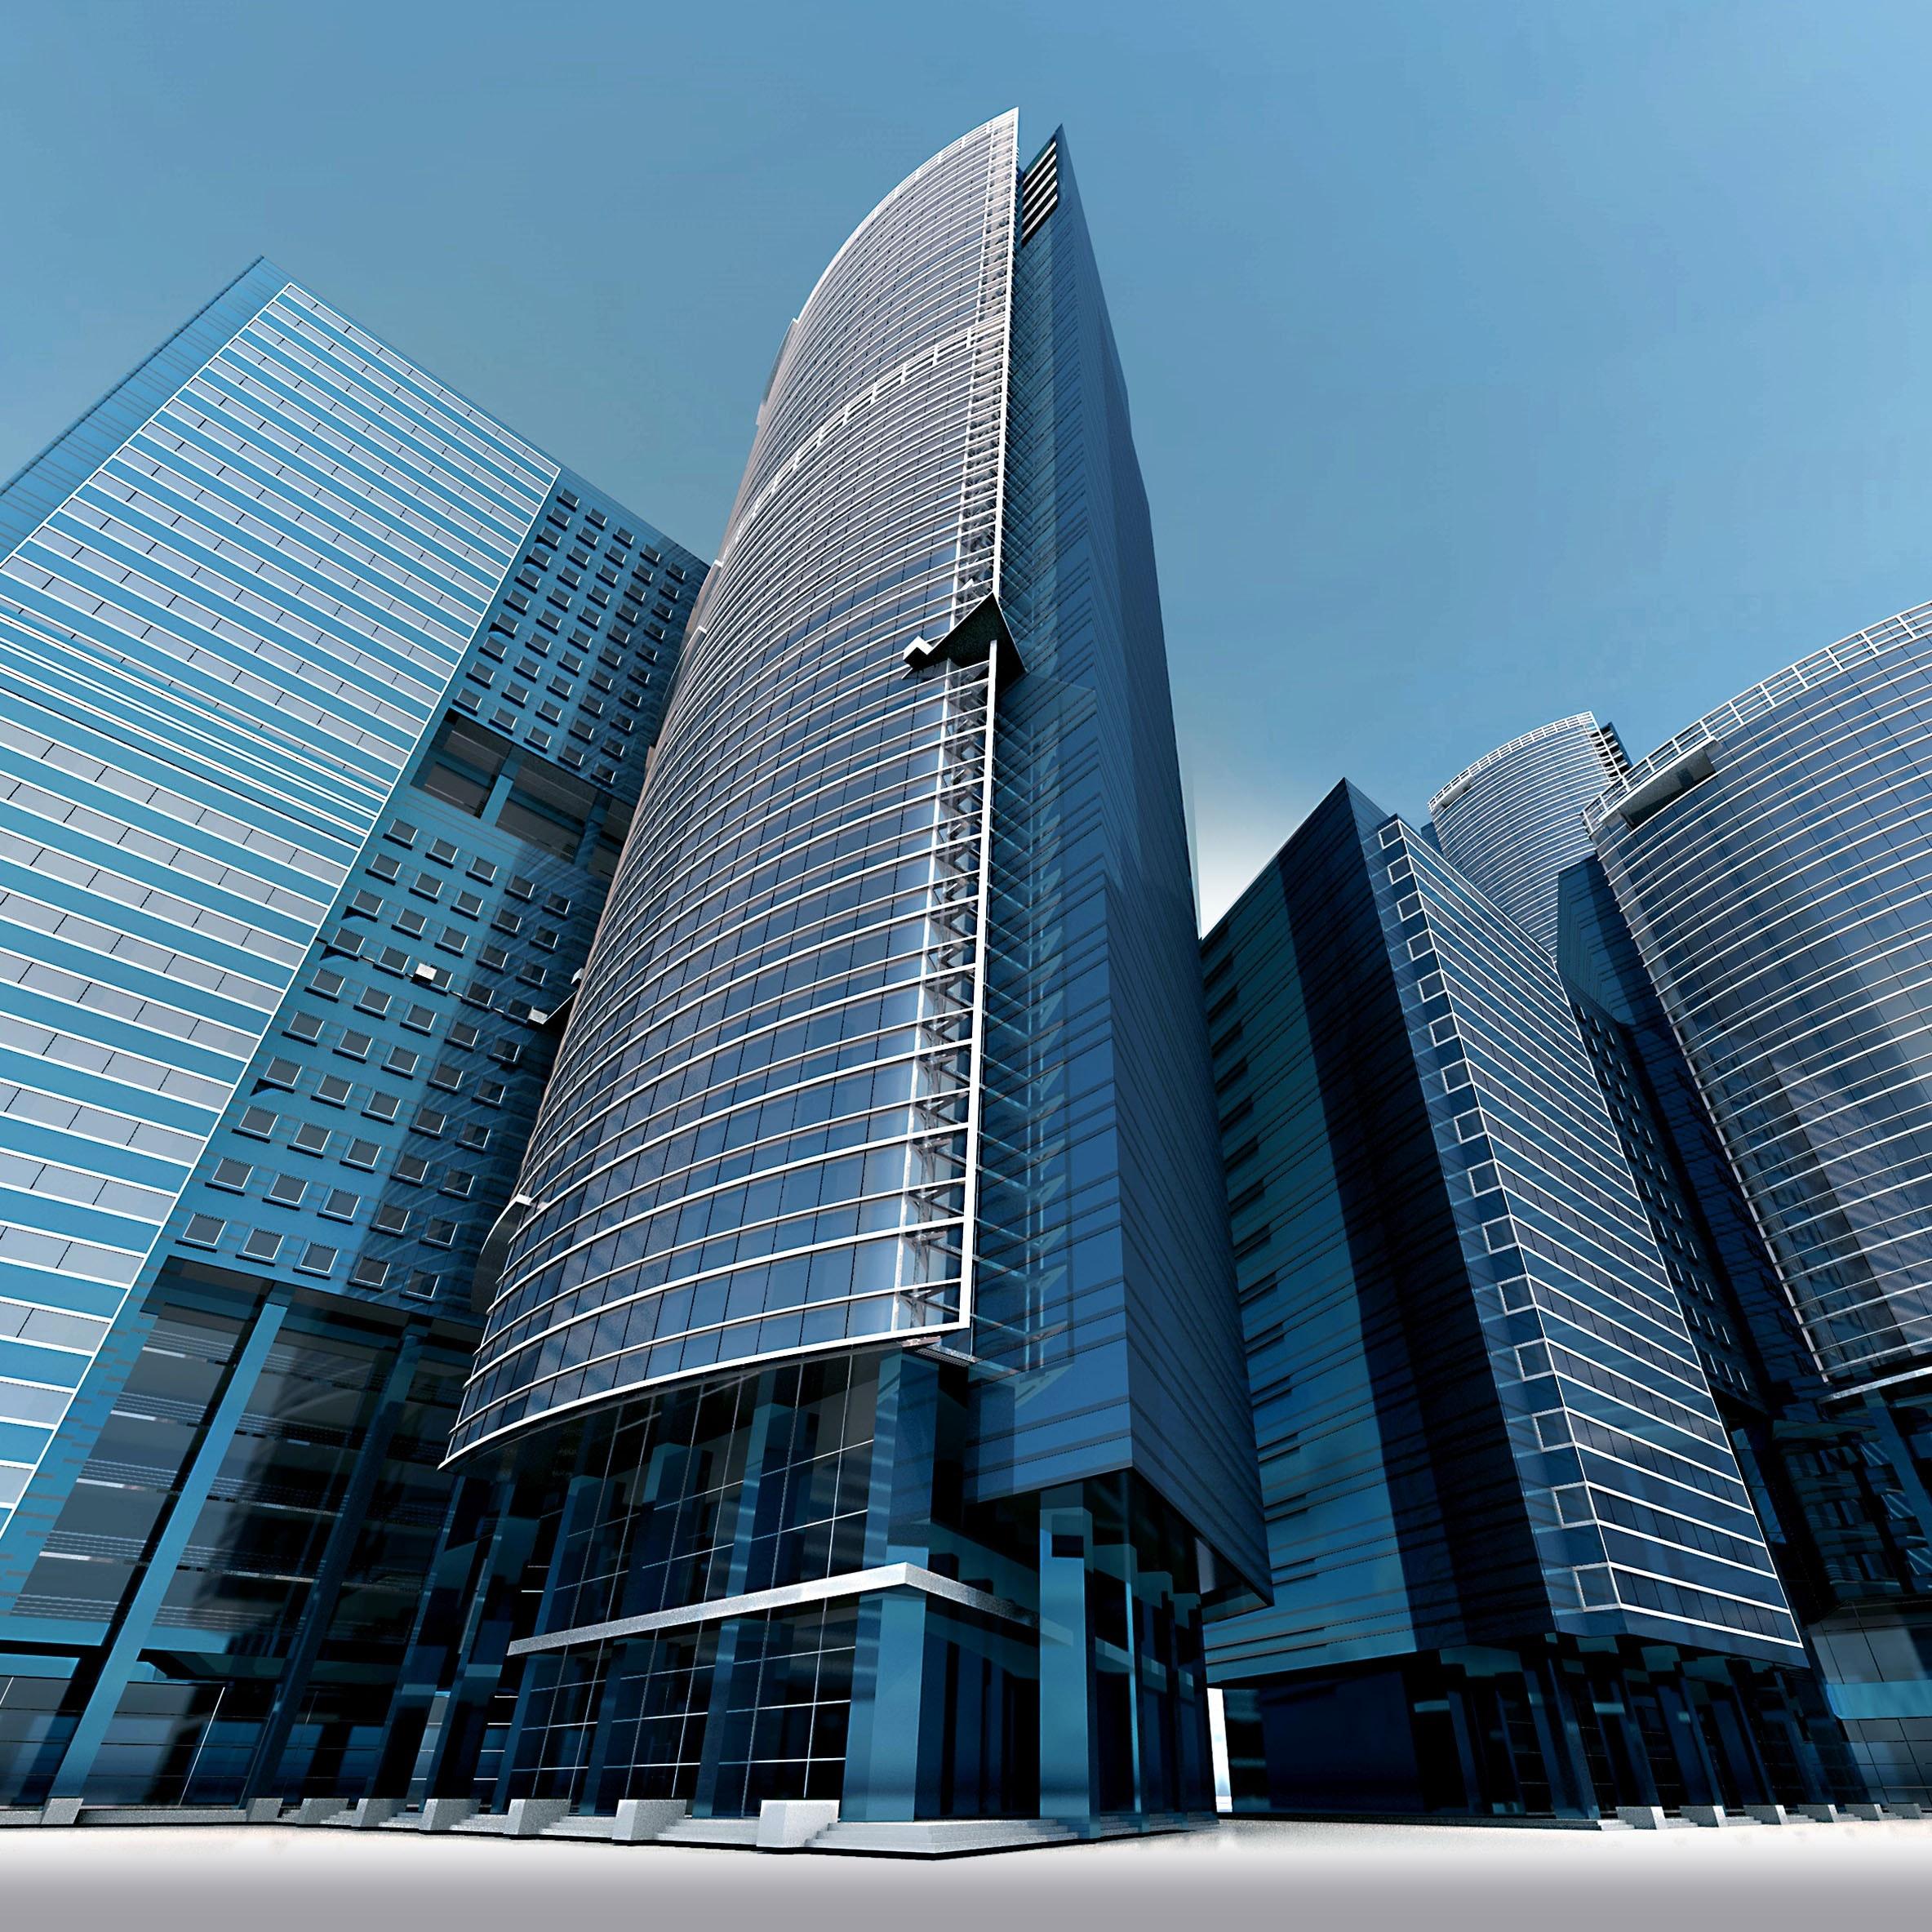 1000 engaging buildings photos pexels free stock photos